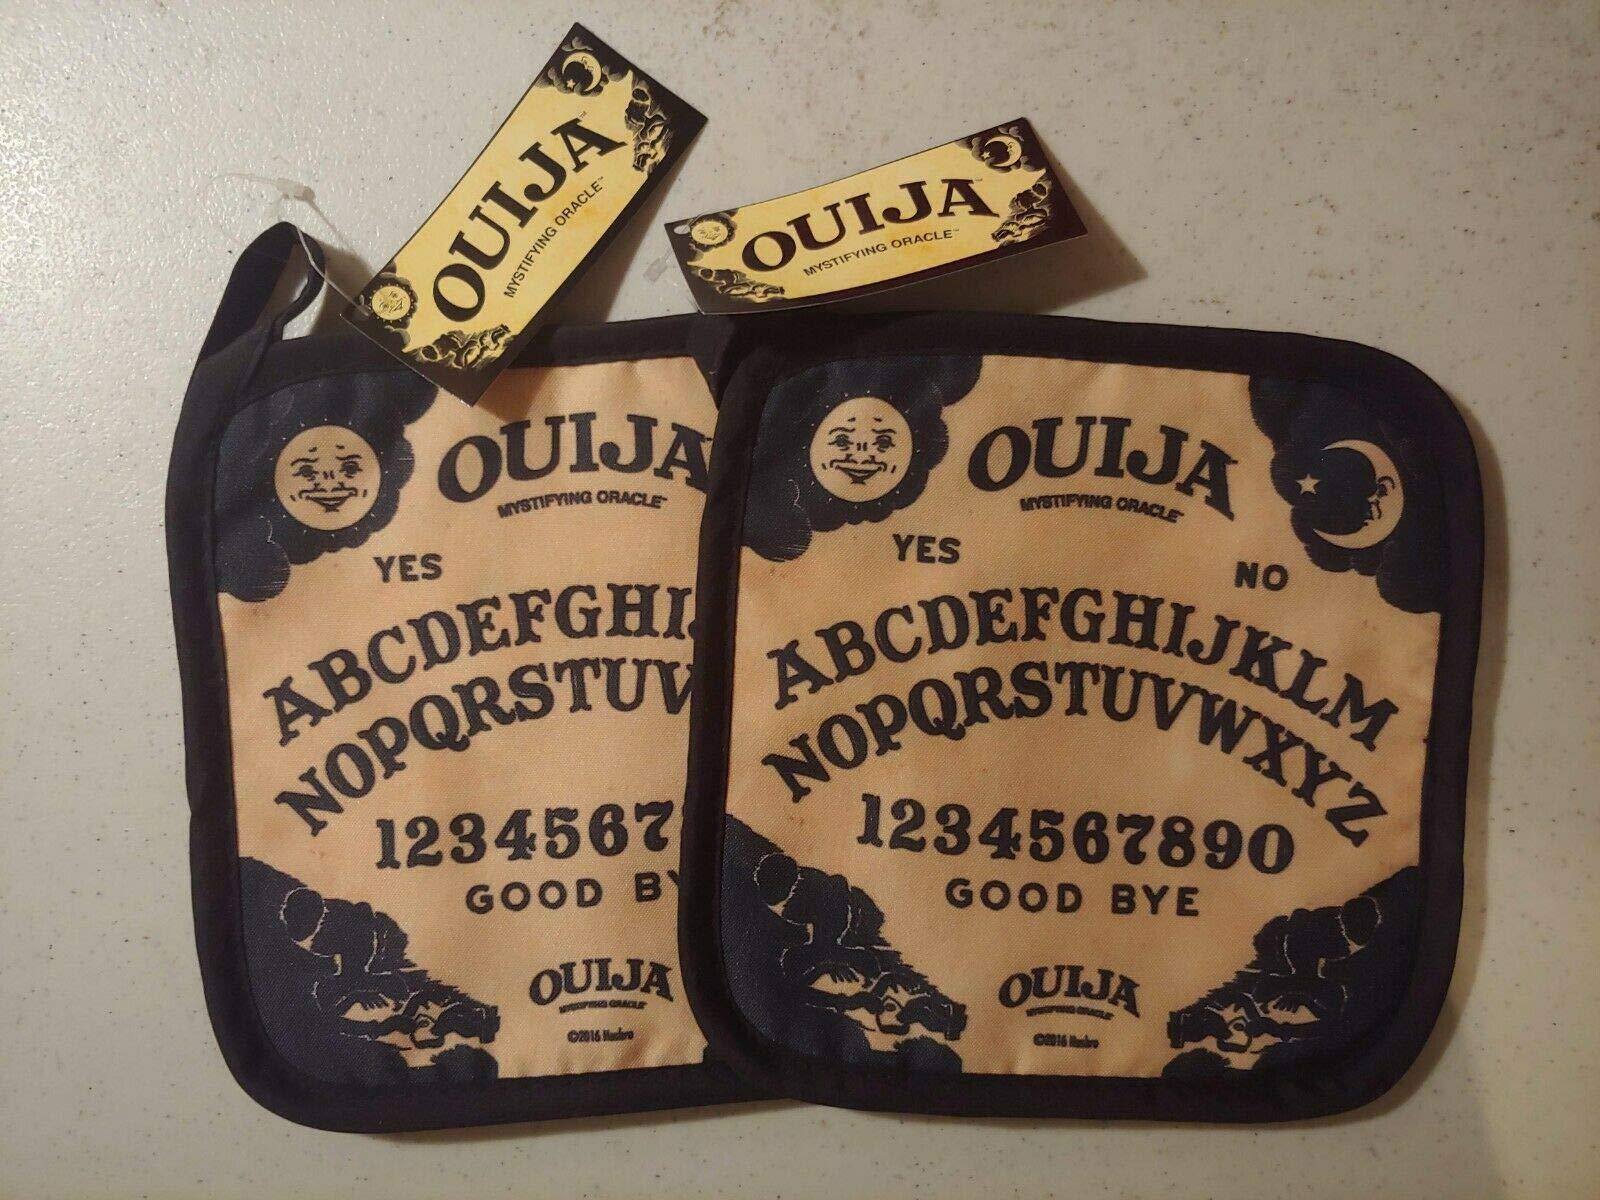 NEW Ouija Board Set of 2 Pot Holders 7'' Halloween Decor Buddstore D1 by BUDDSTORE